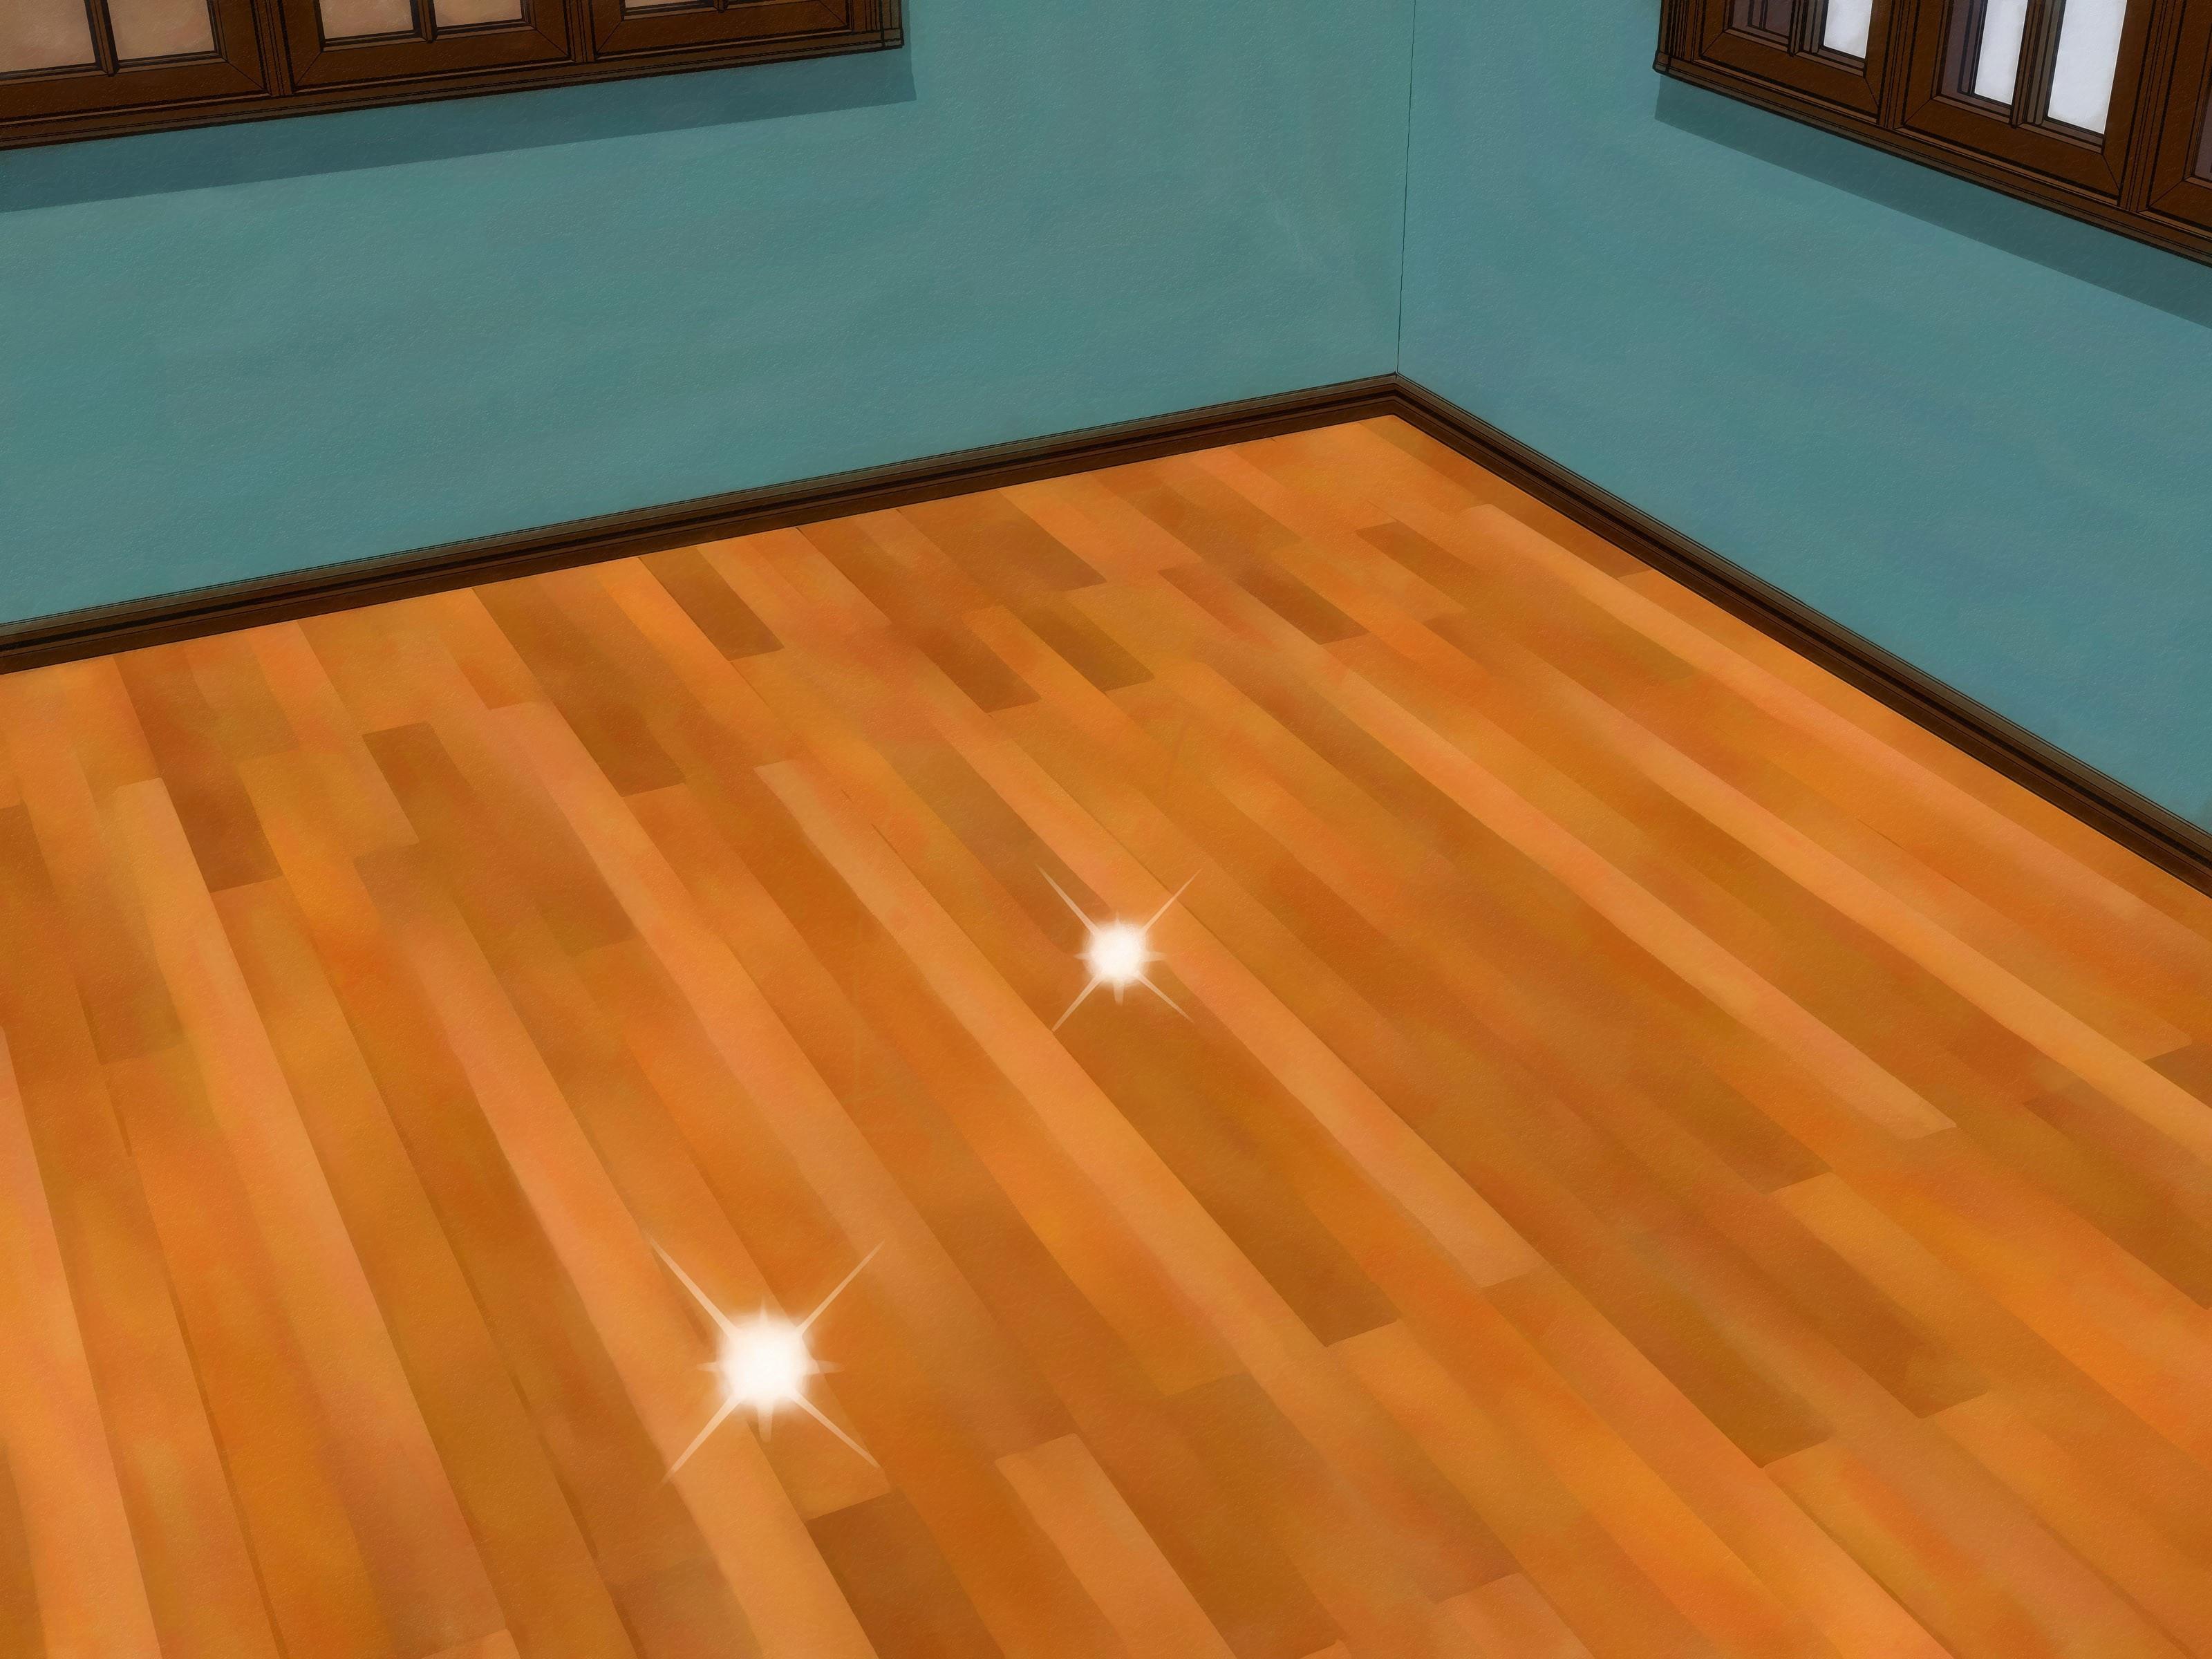 17 Cute Hardwood Floor Refinishing St Louis 2021 free download hardwood floor refinishing st louis of 13 luxury repair hardwood floor collection dizpos com throughout repair hardwood floor awesome 50 best how to get wax f hardwood floors graphics 50 s